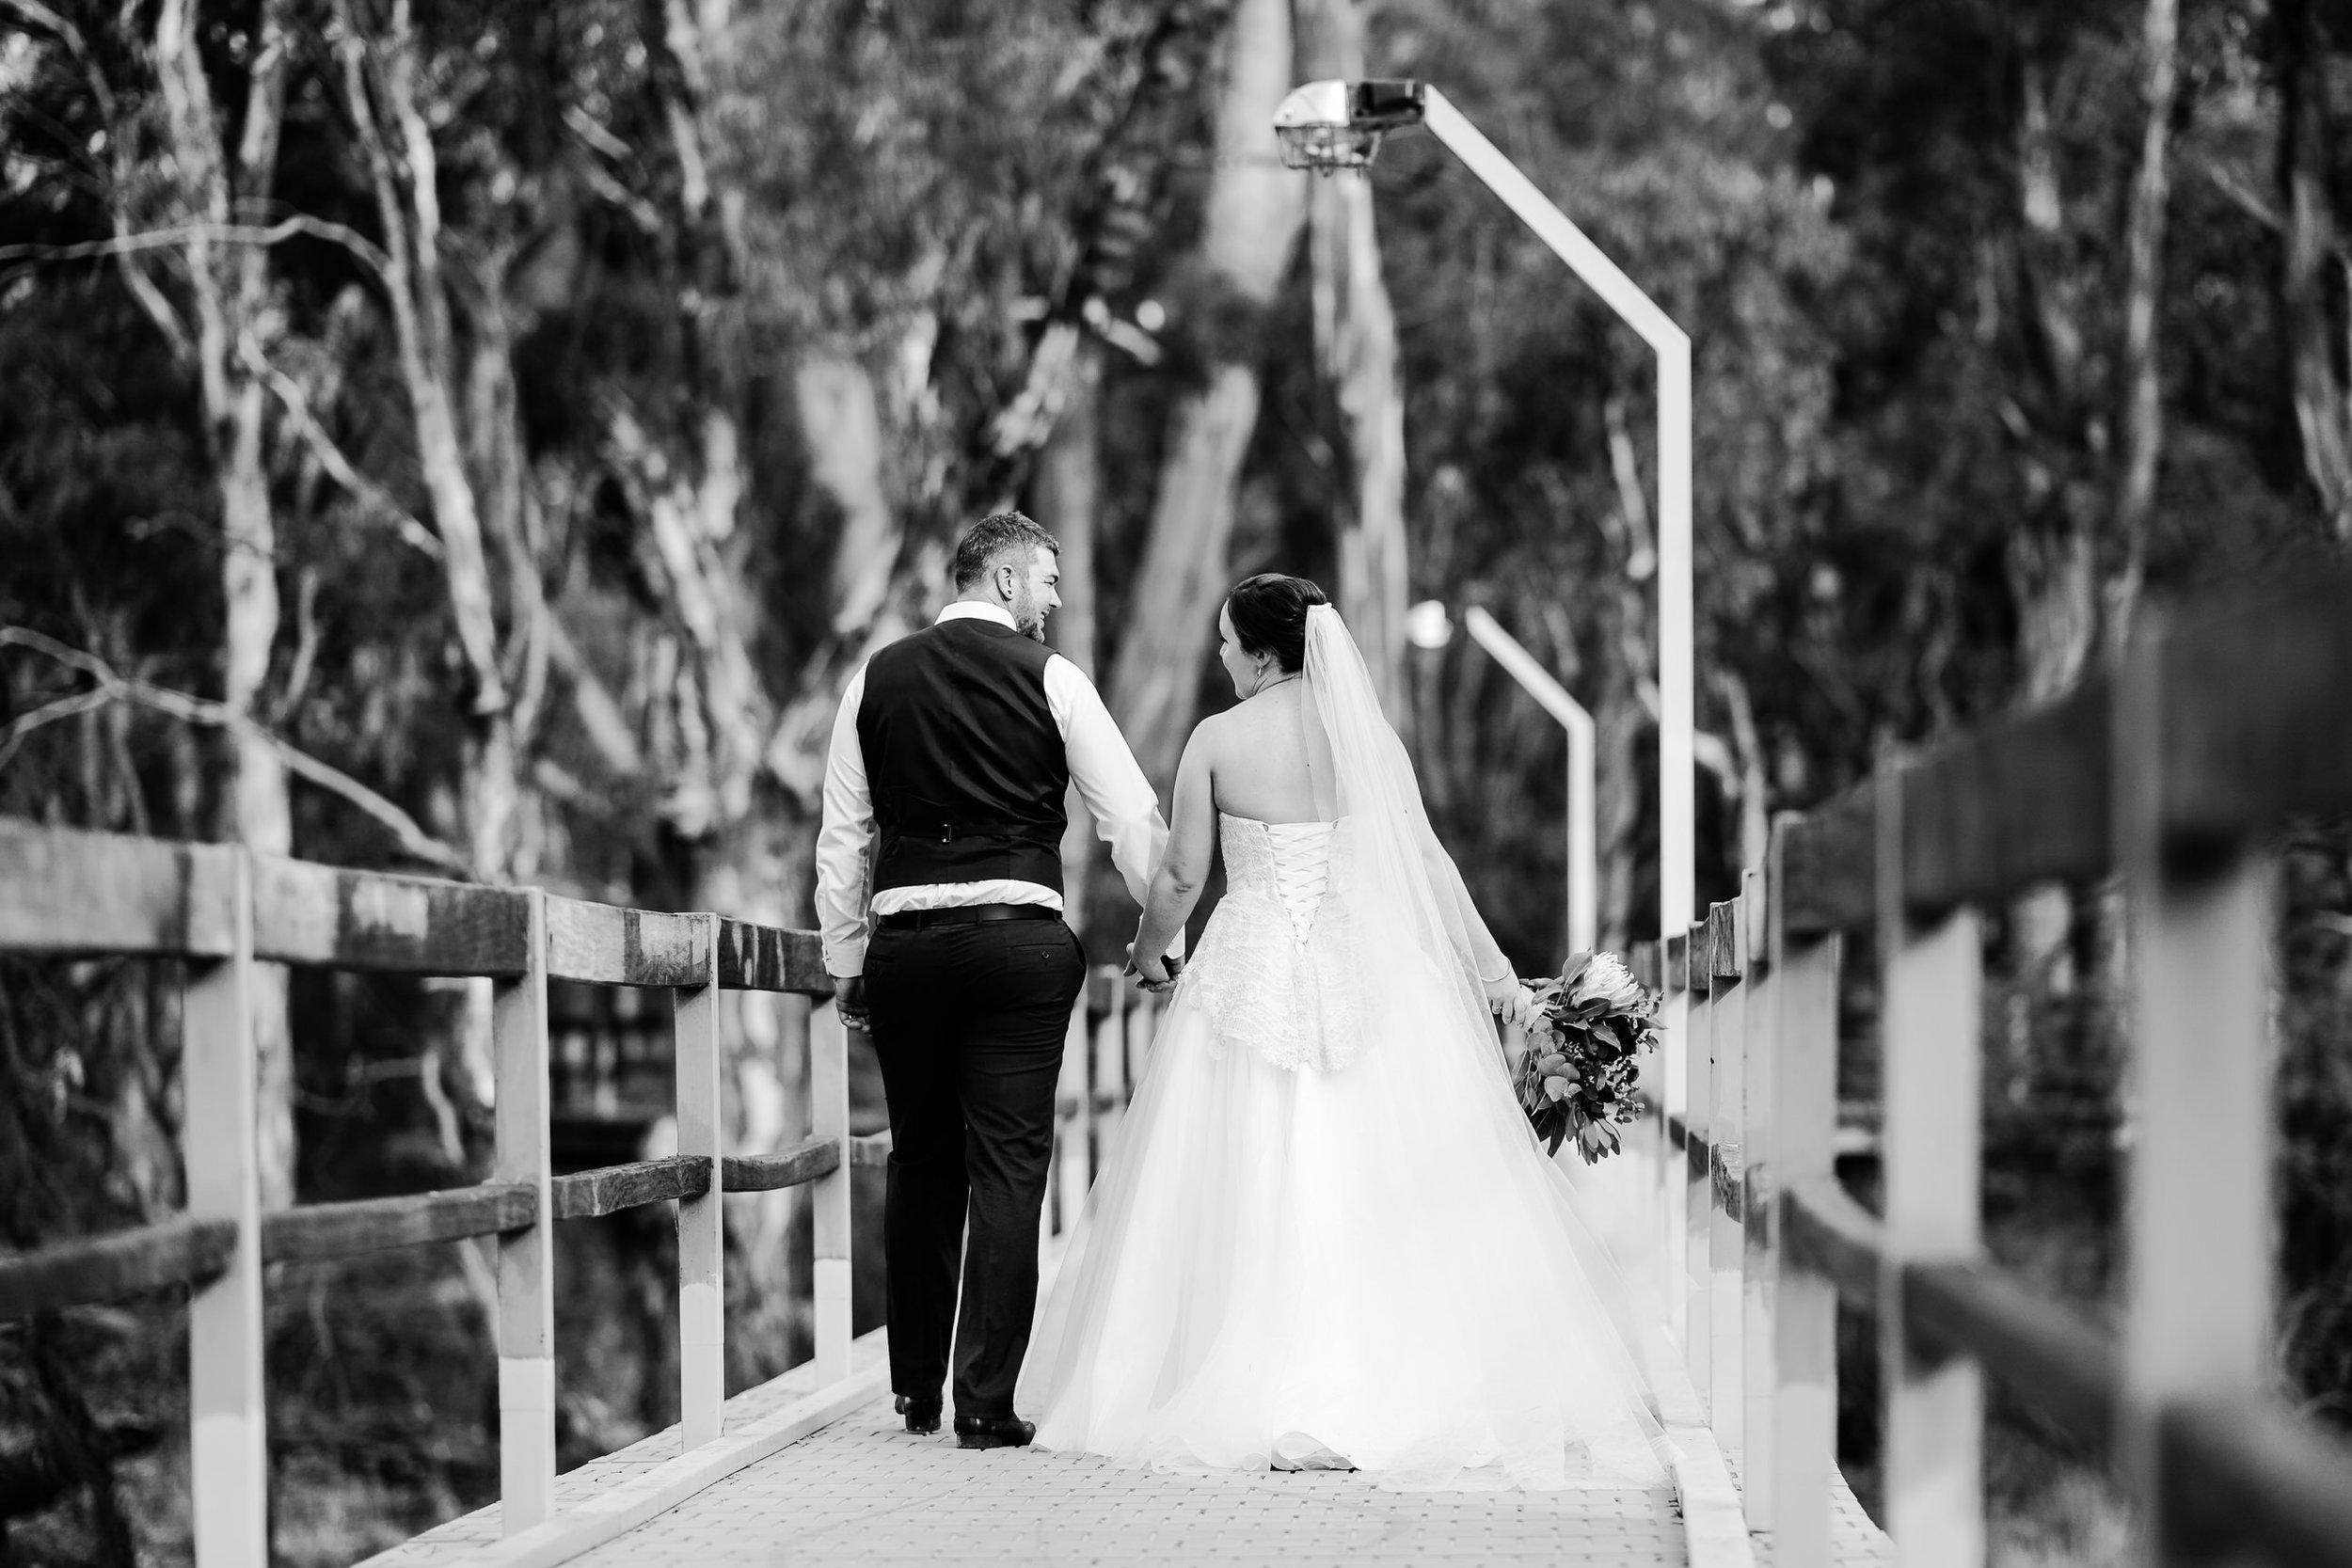 Justin_Jim_Echuca_Wedding_Photography_Tindarra-259.JPG